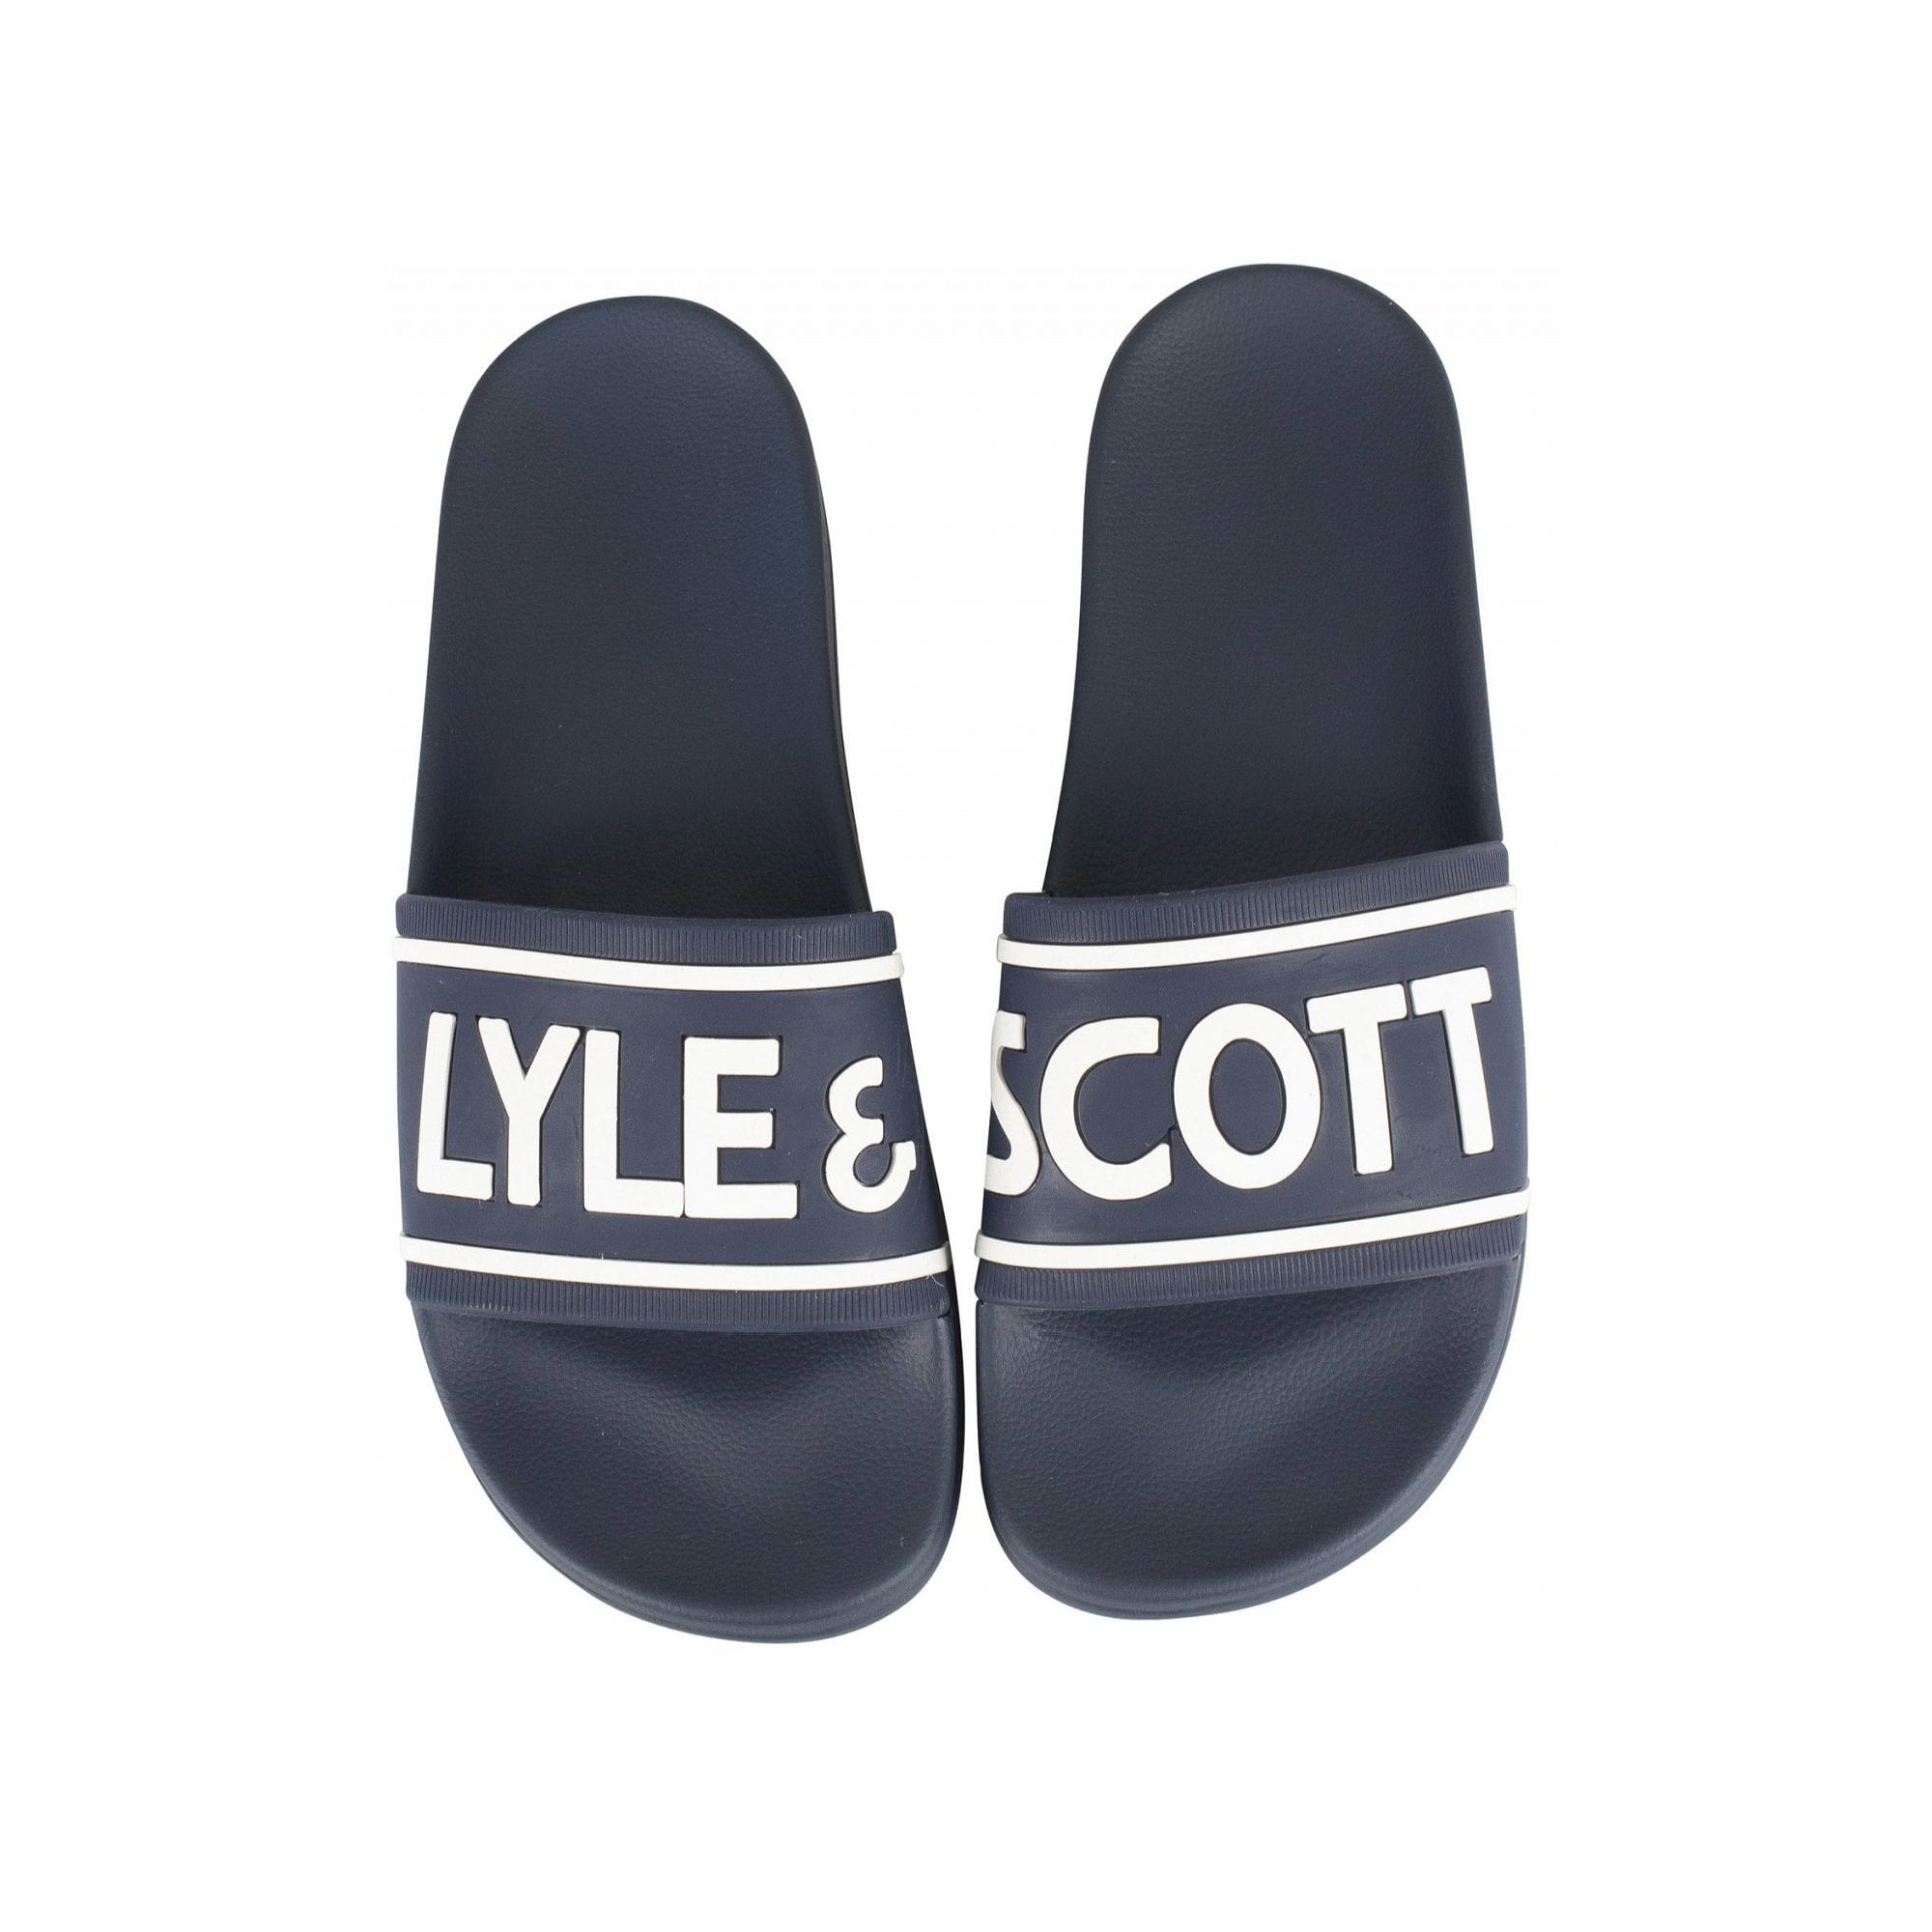 Lyle /& Scott FW814 Thomas Flip Flops Black